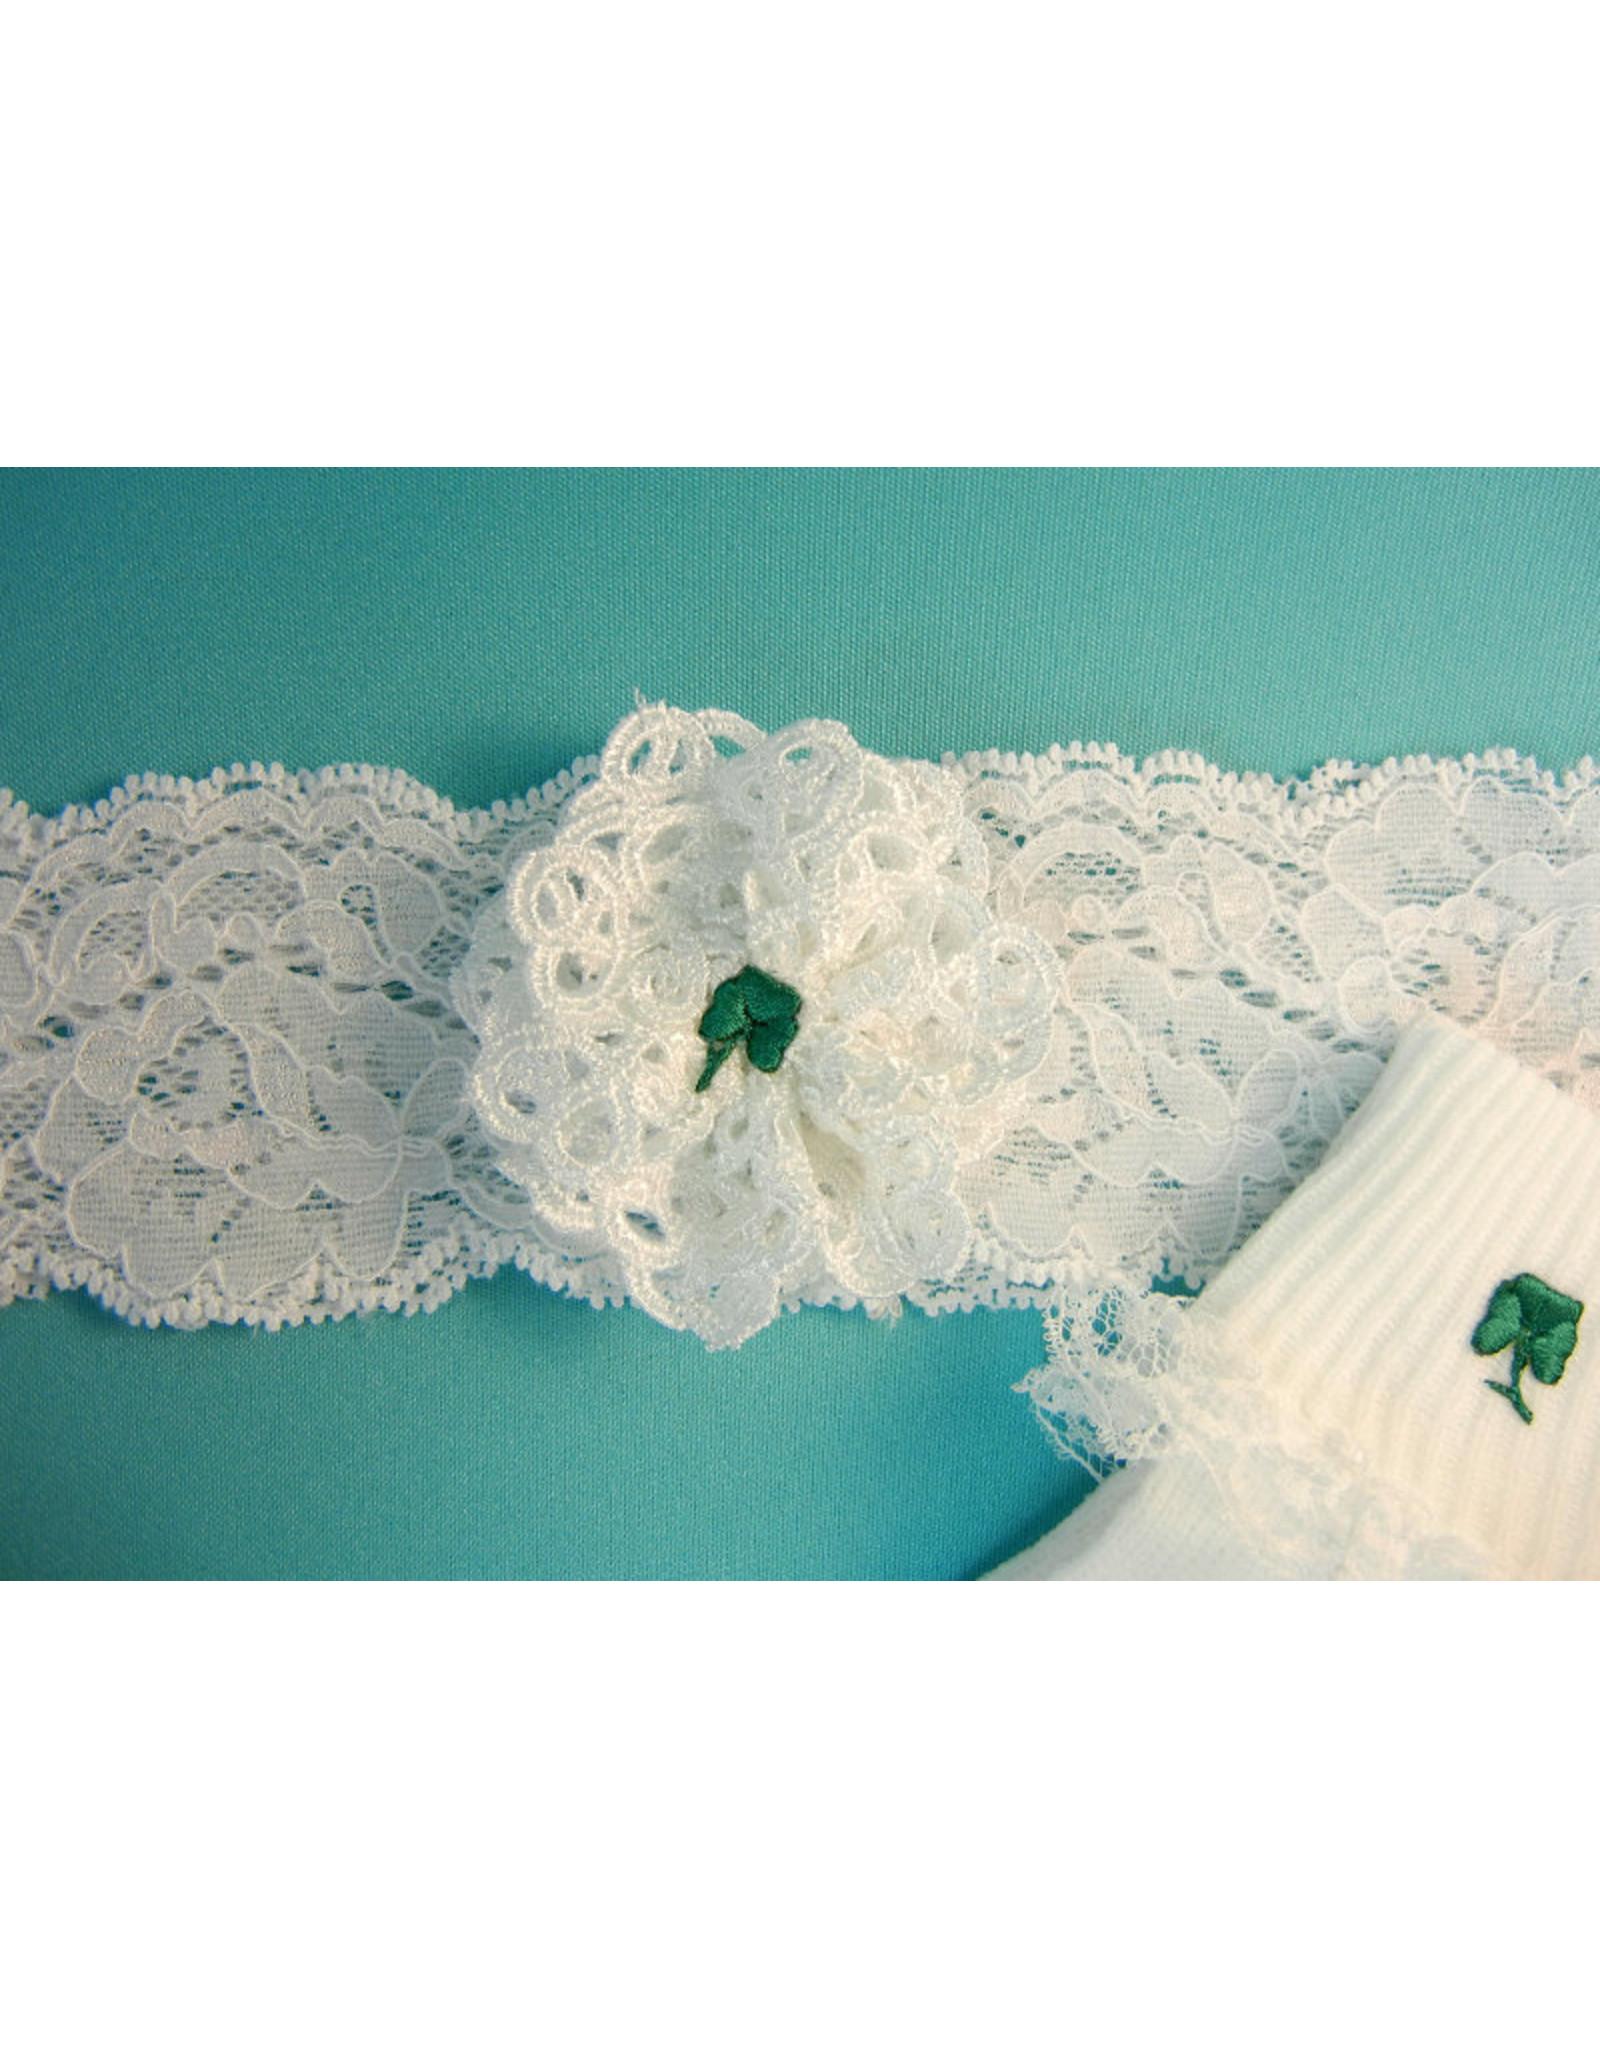 Simply Charming Baby Headband White w/Green Shamrock